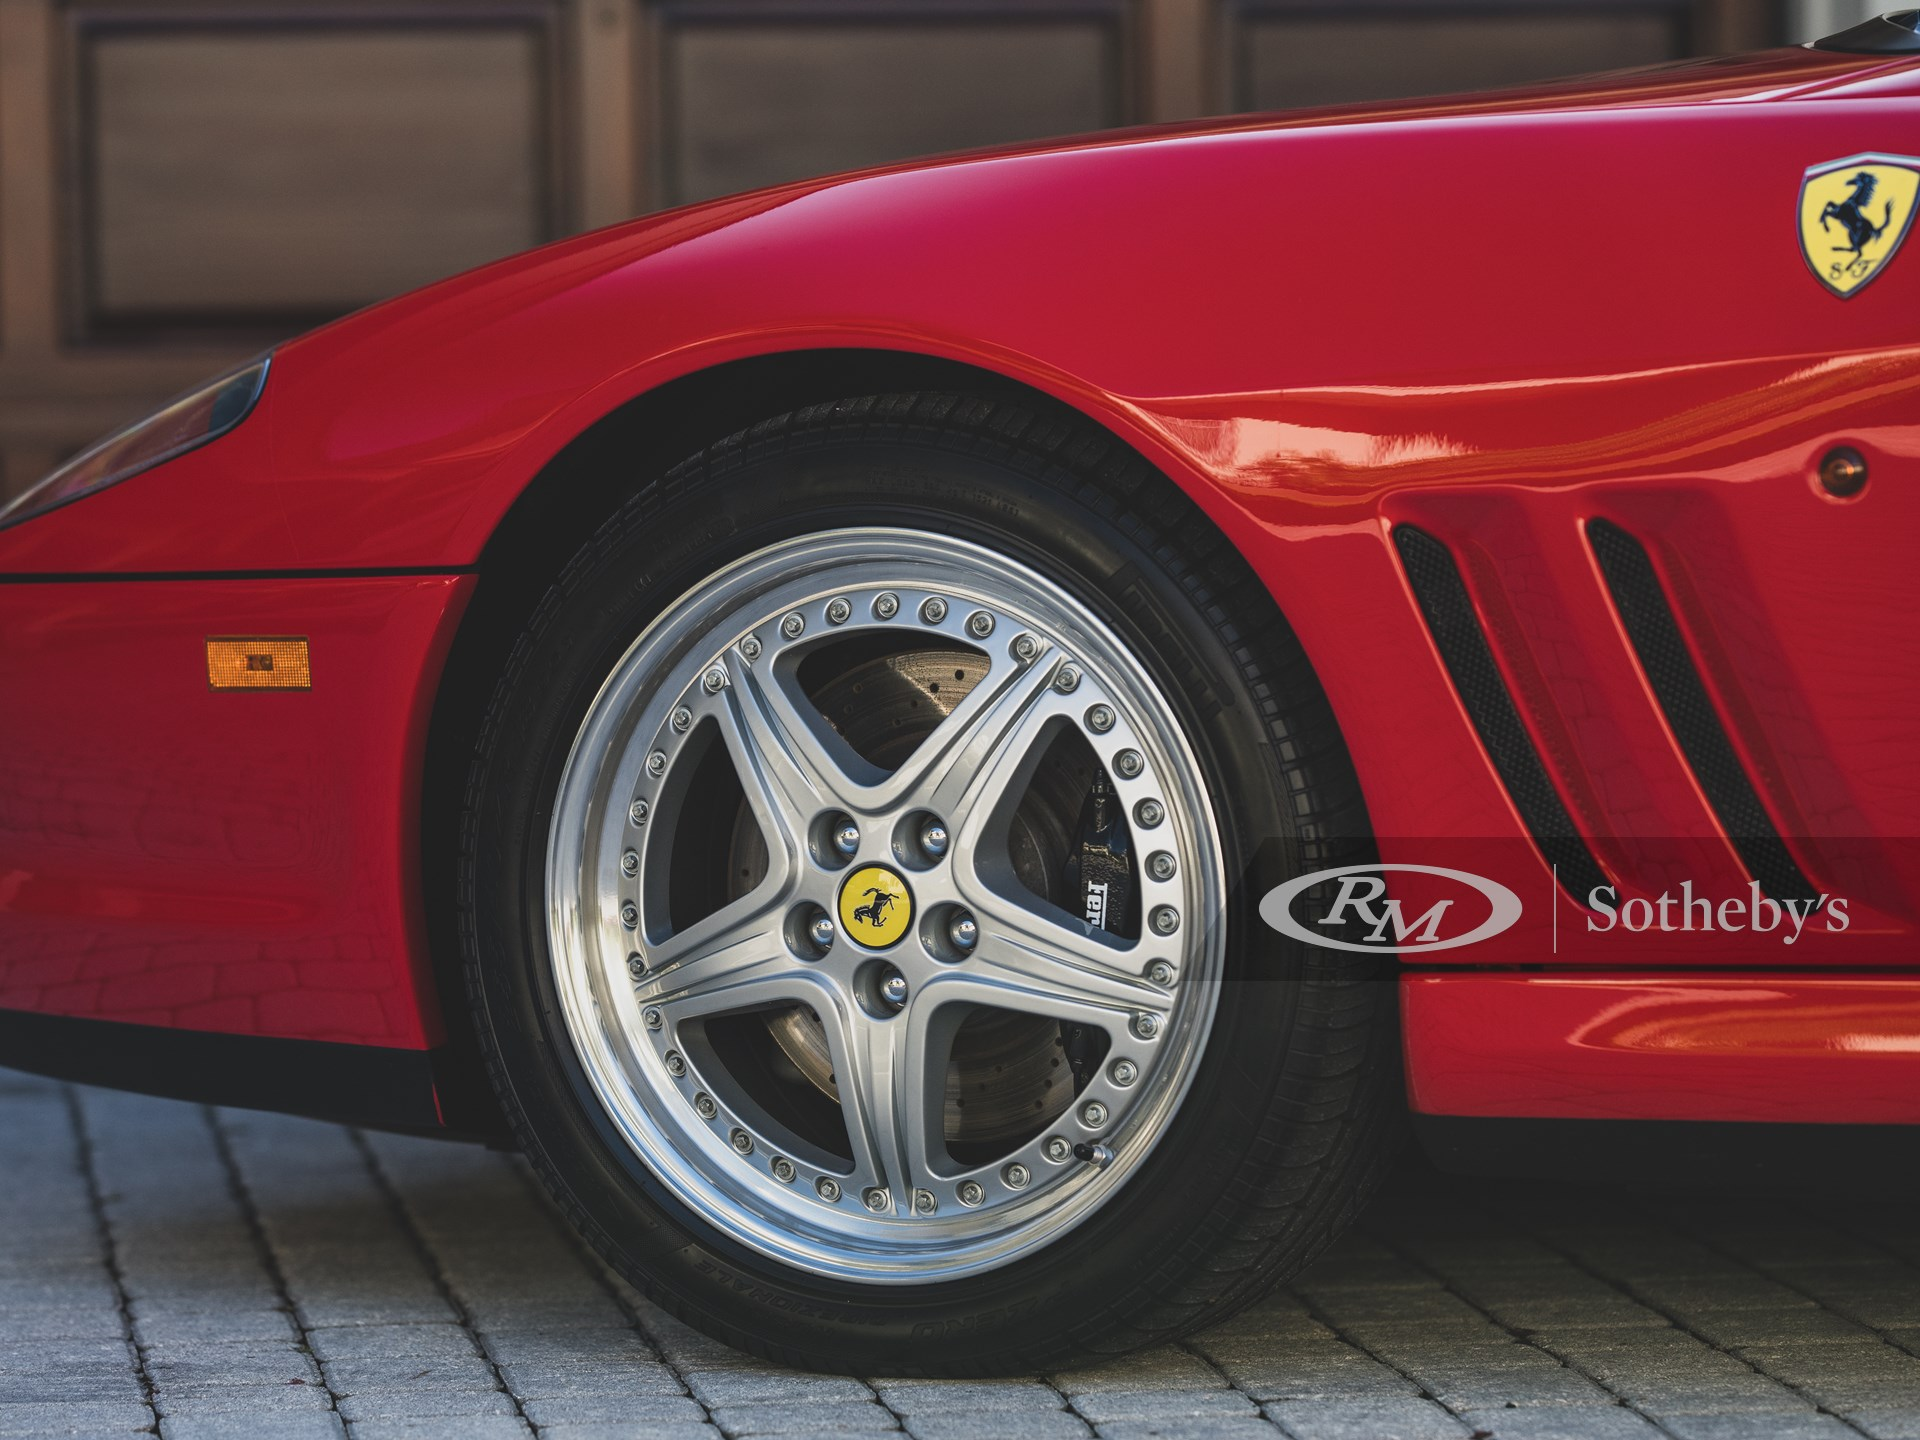 2001 Ferrari 550 Barchetta Pininfarina Prototype  -